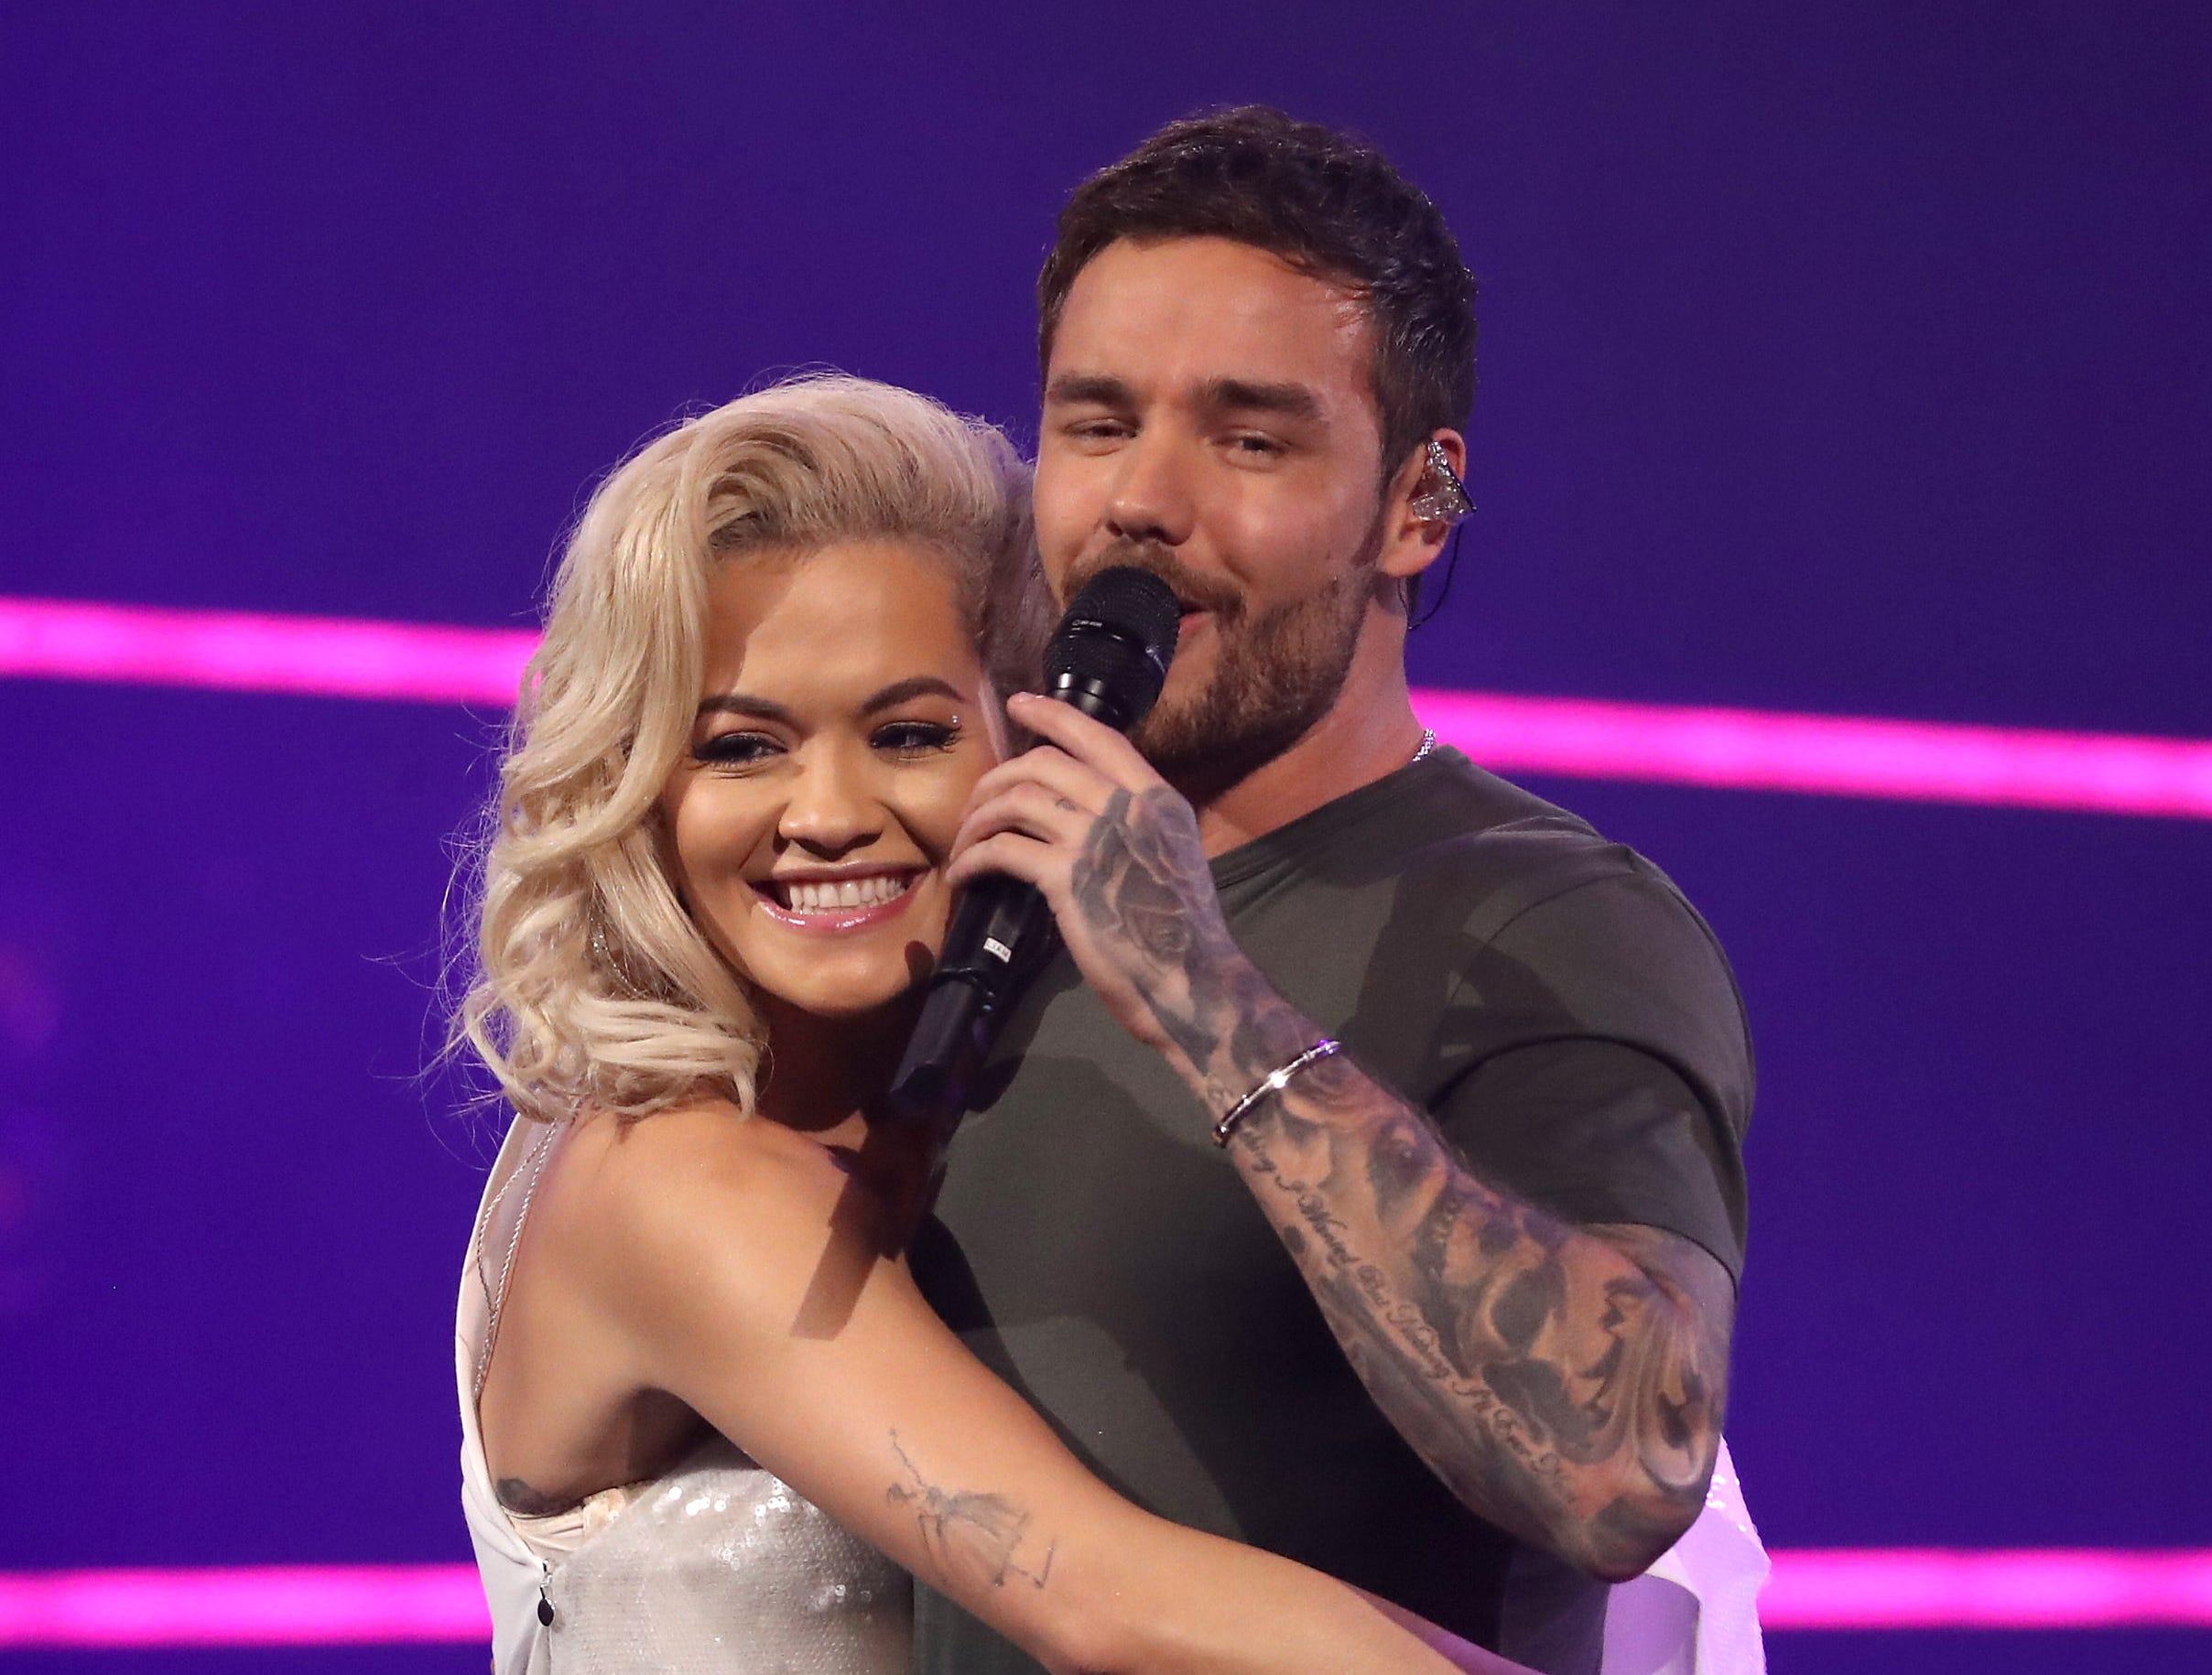 October 30: Rita Ora hugs  Liam Payne at Westfield White City in London, England.